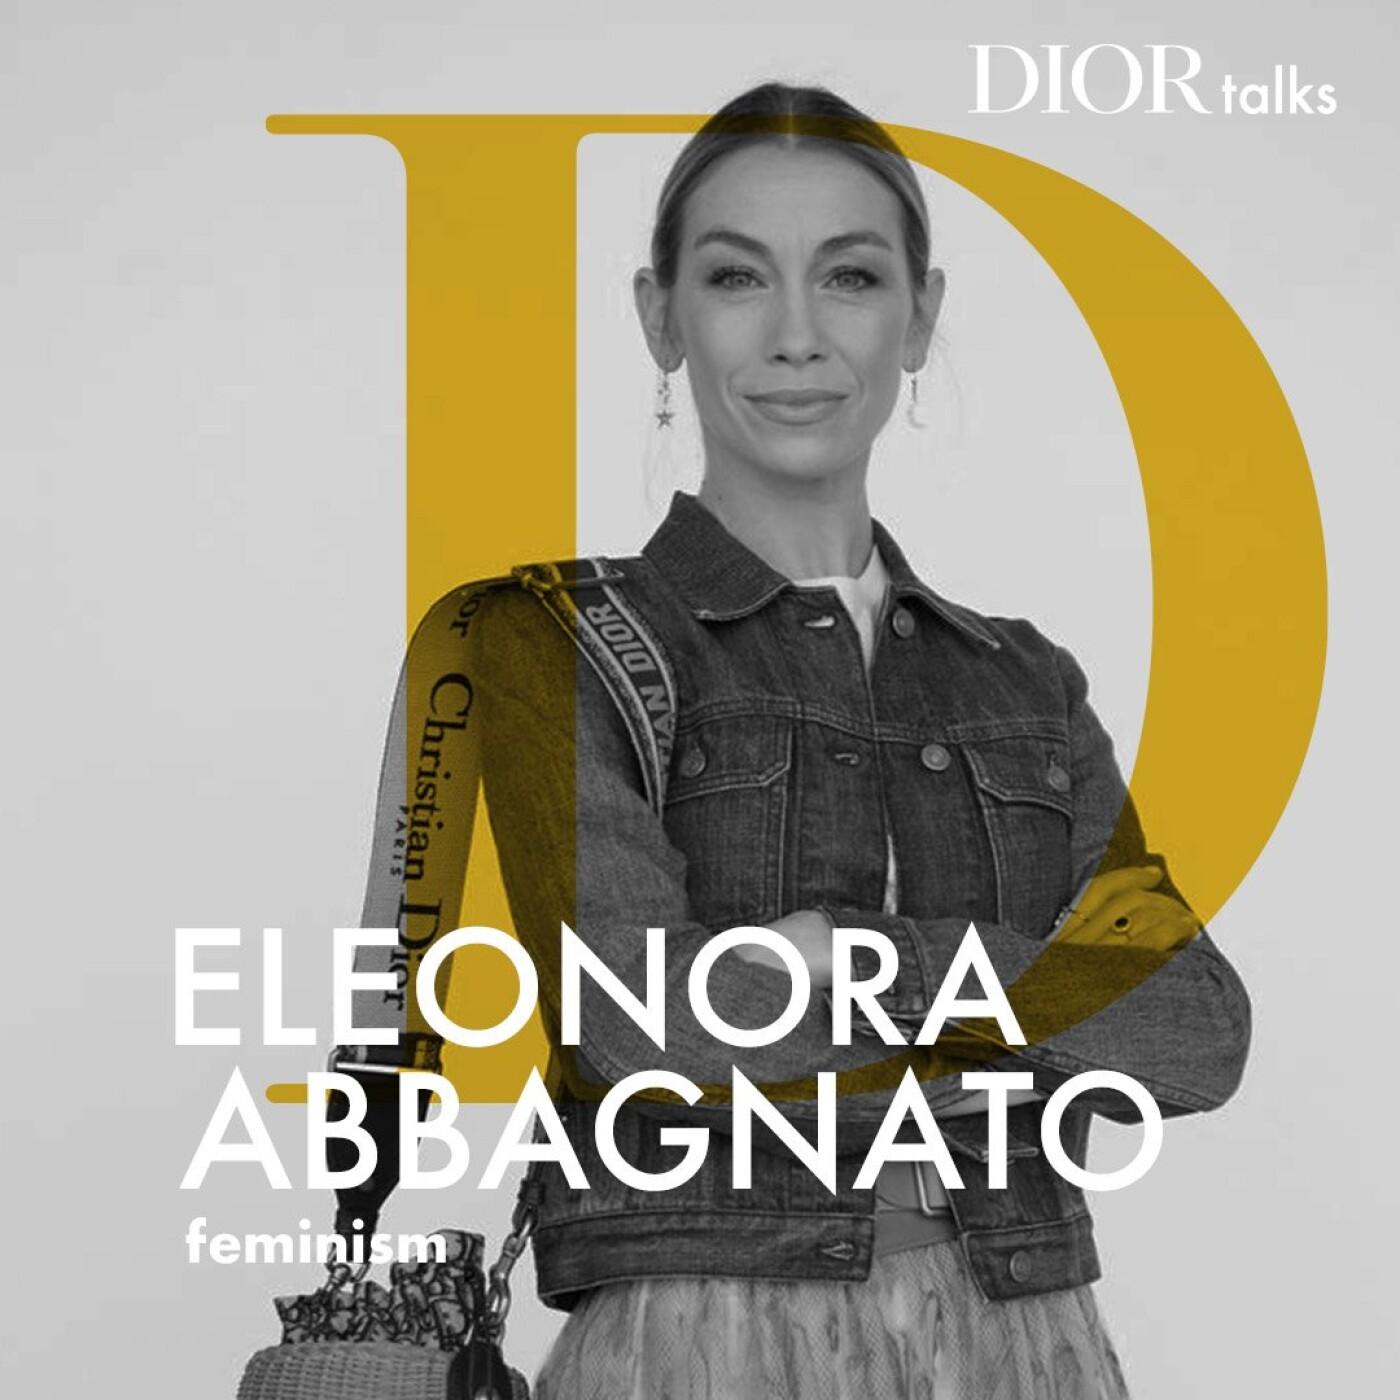 [Feminism] Eleonora Abbagnato, star of international ballet & regular collaborator with Dior, discusses feminism & childhood dreams of dance